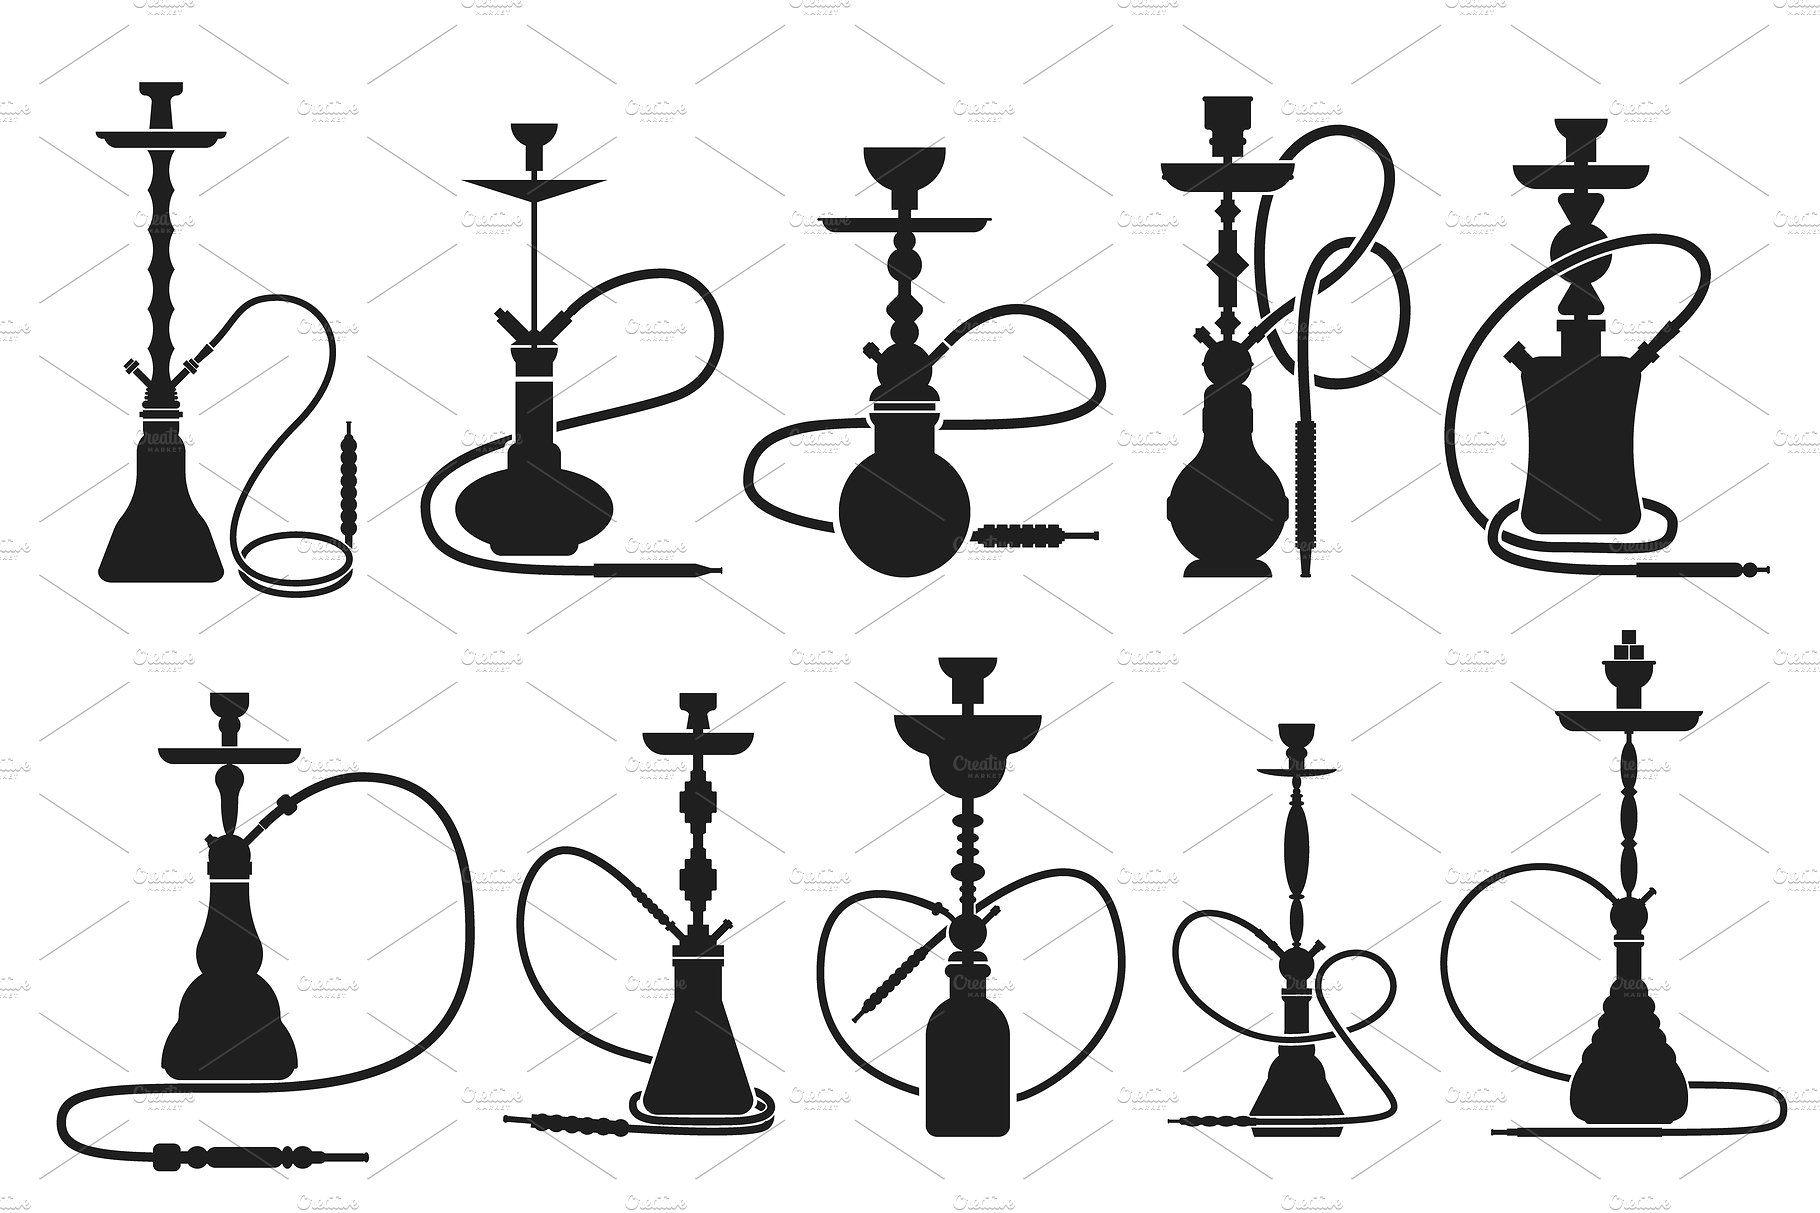 Hookahs Set Silhouettes Kalyany Graficheskij Dizajn Vdohnovenie